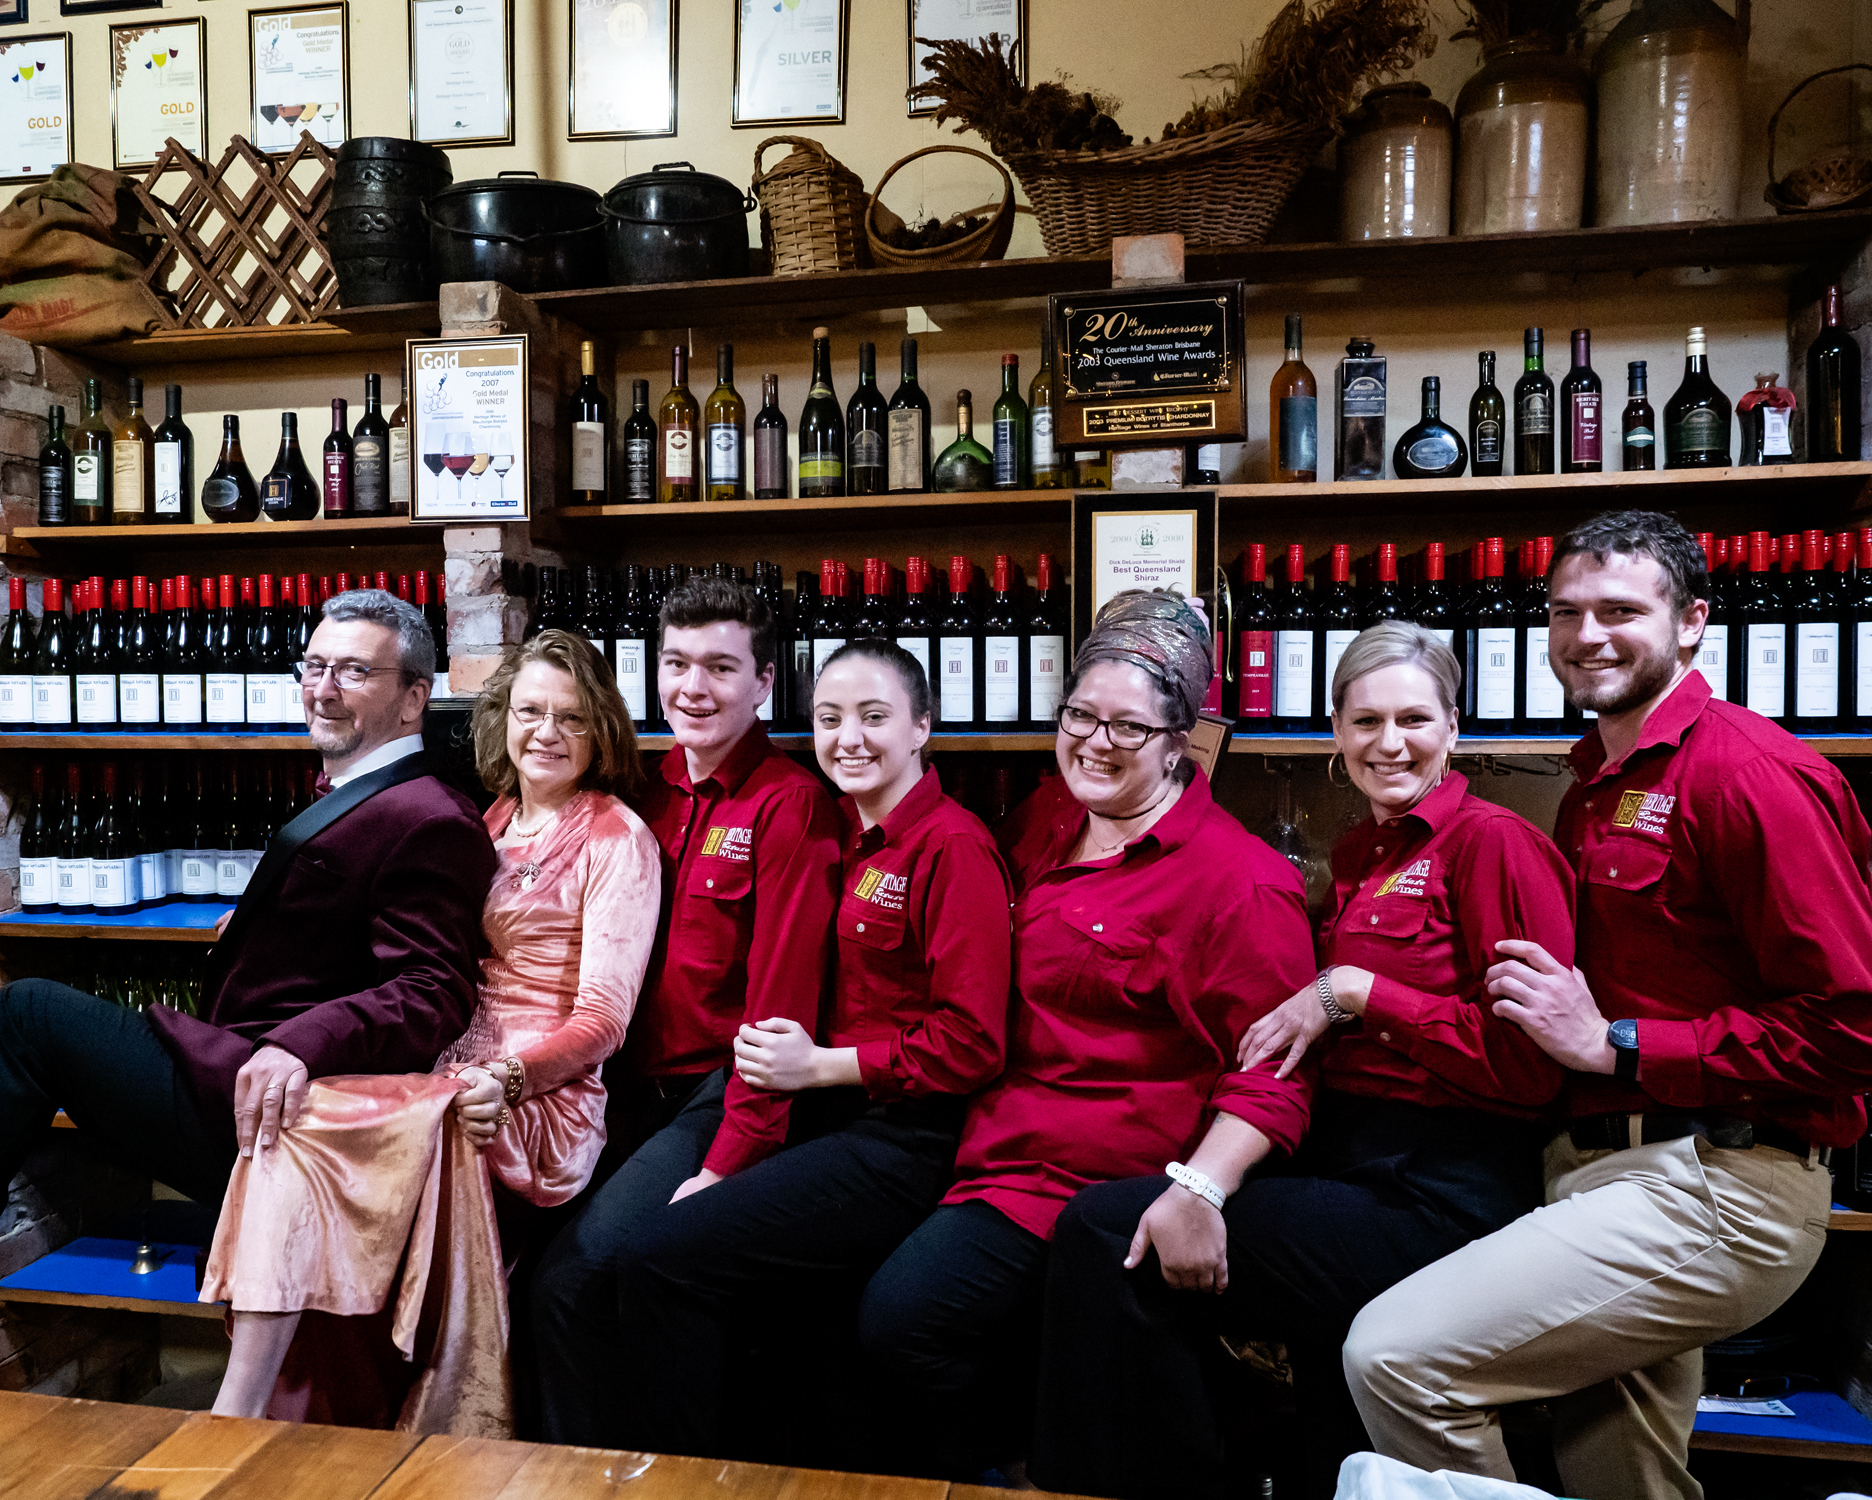 The hospitality team